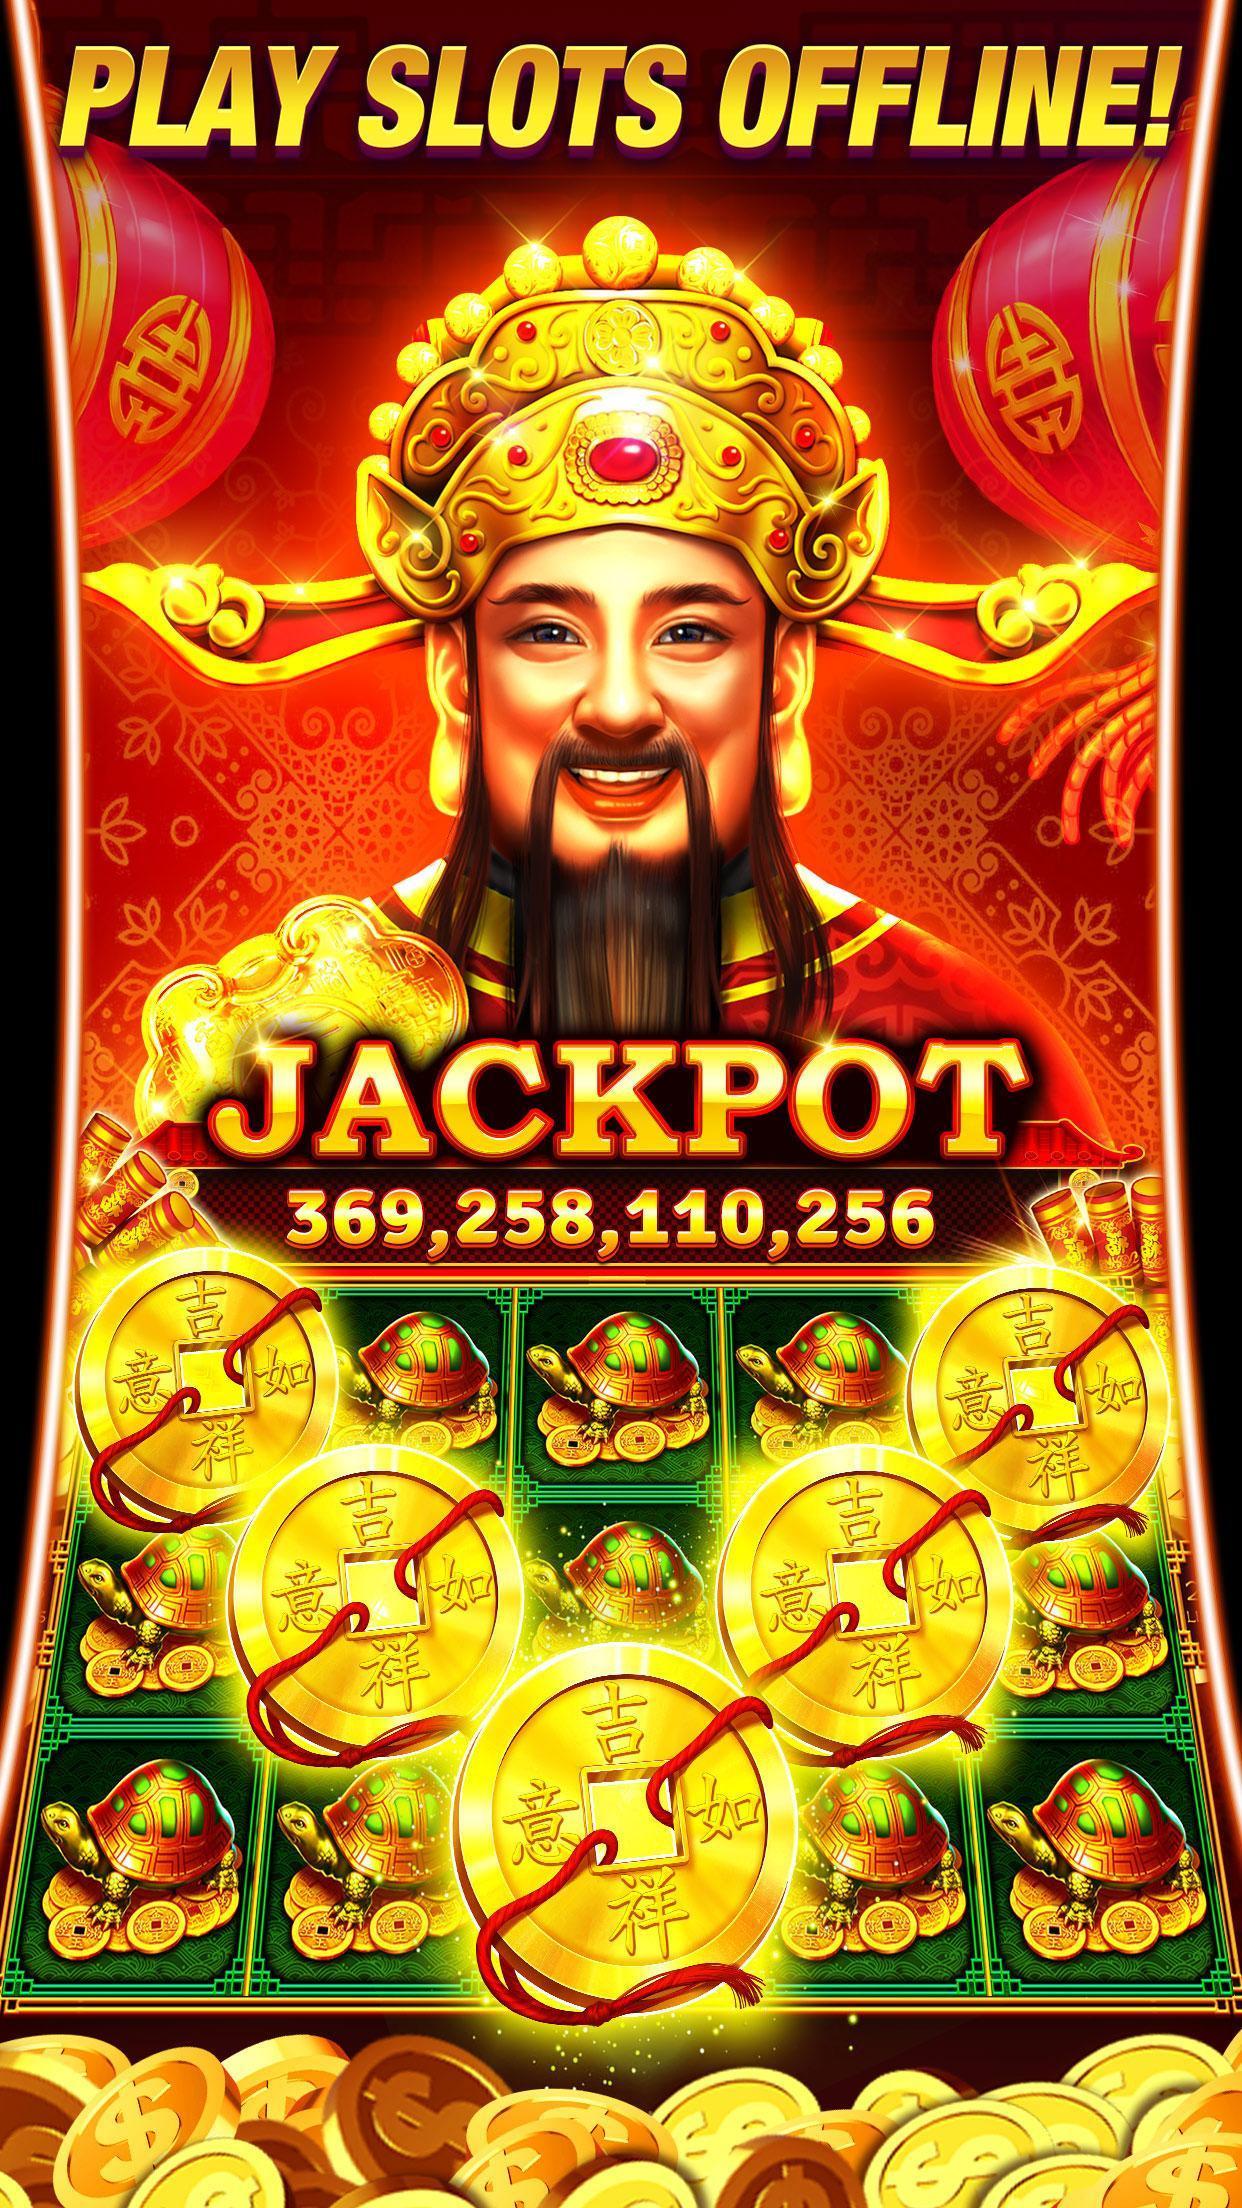 Slot casino jackpot mania apk